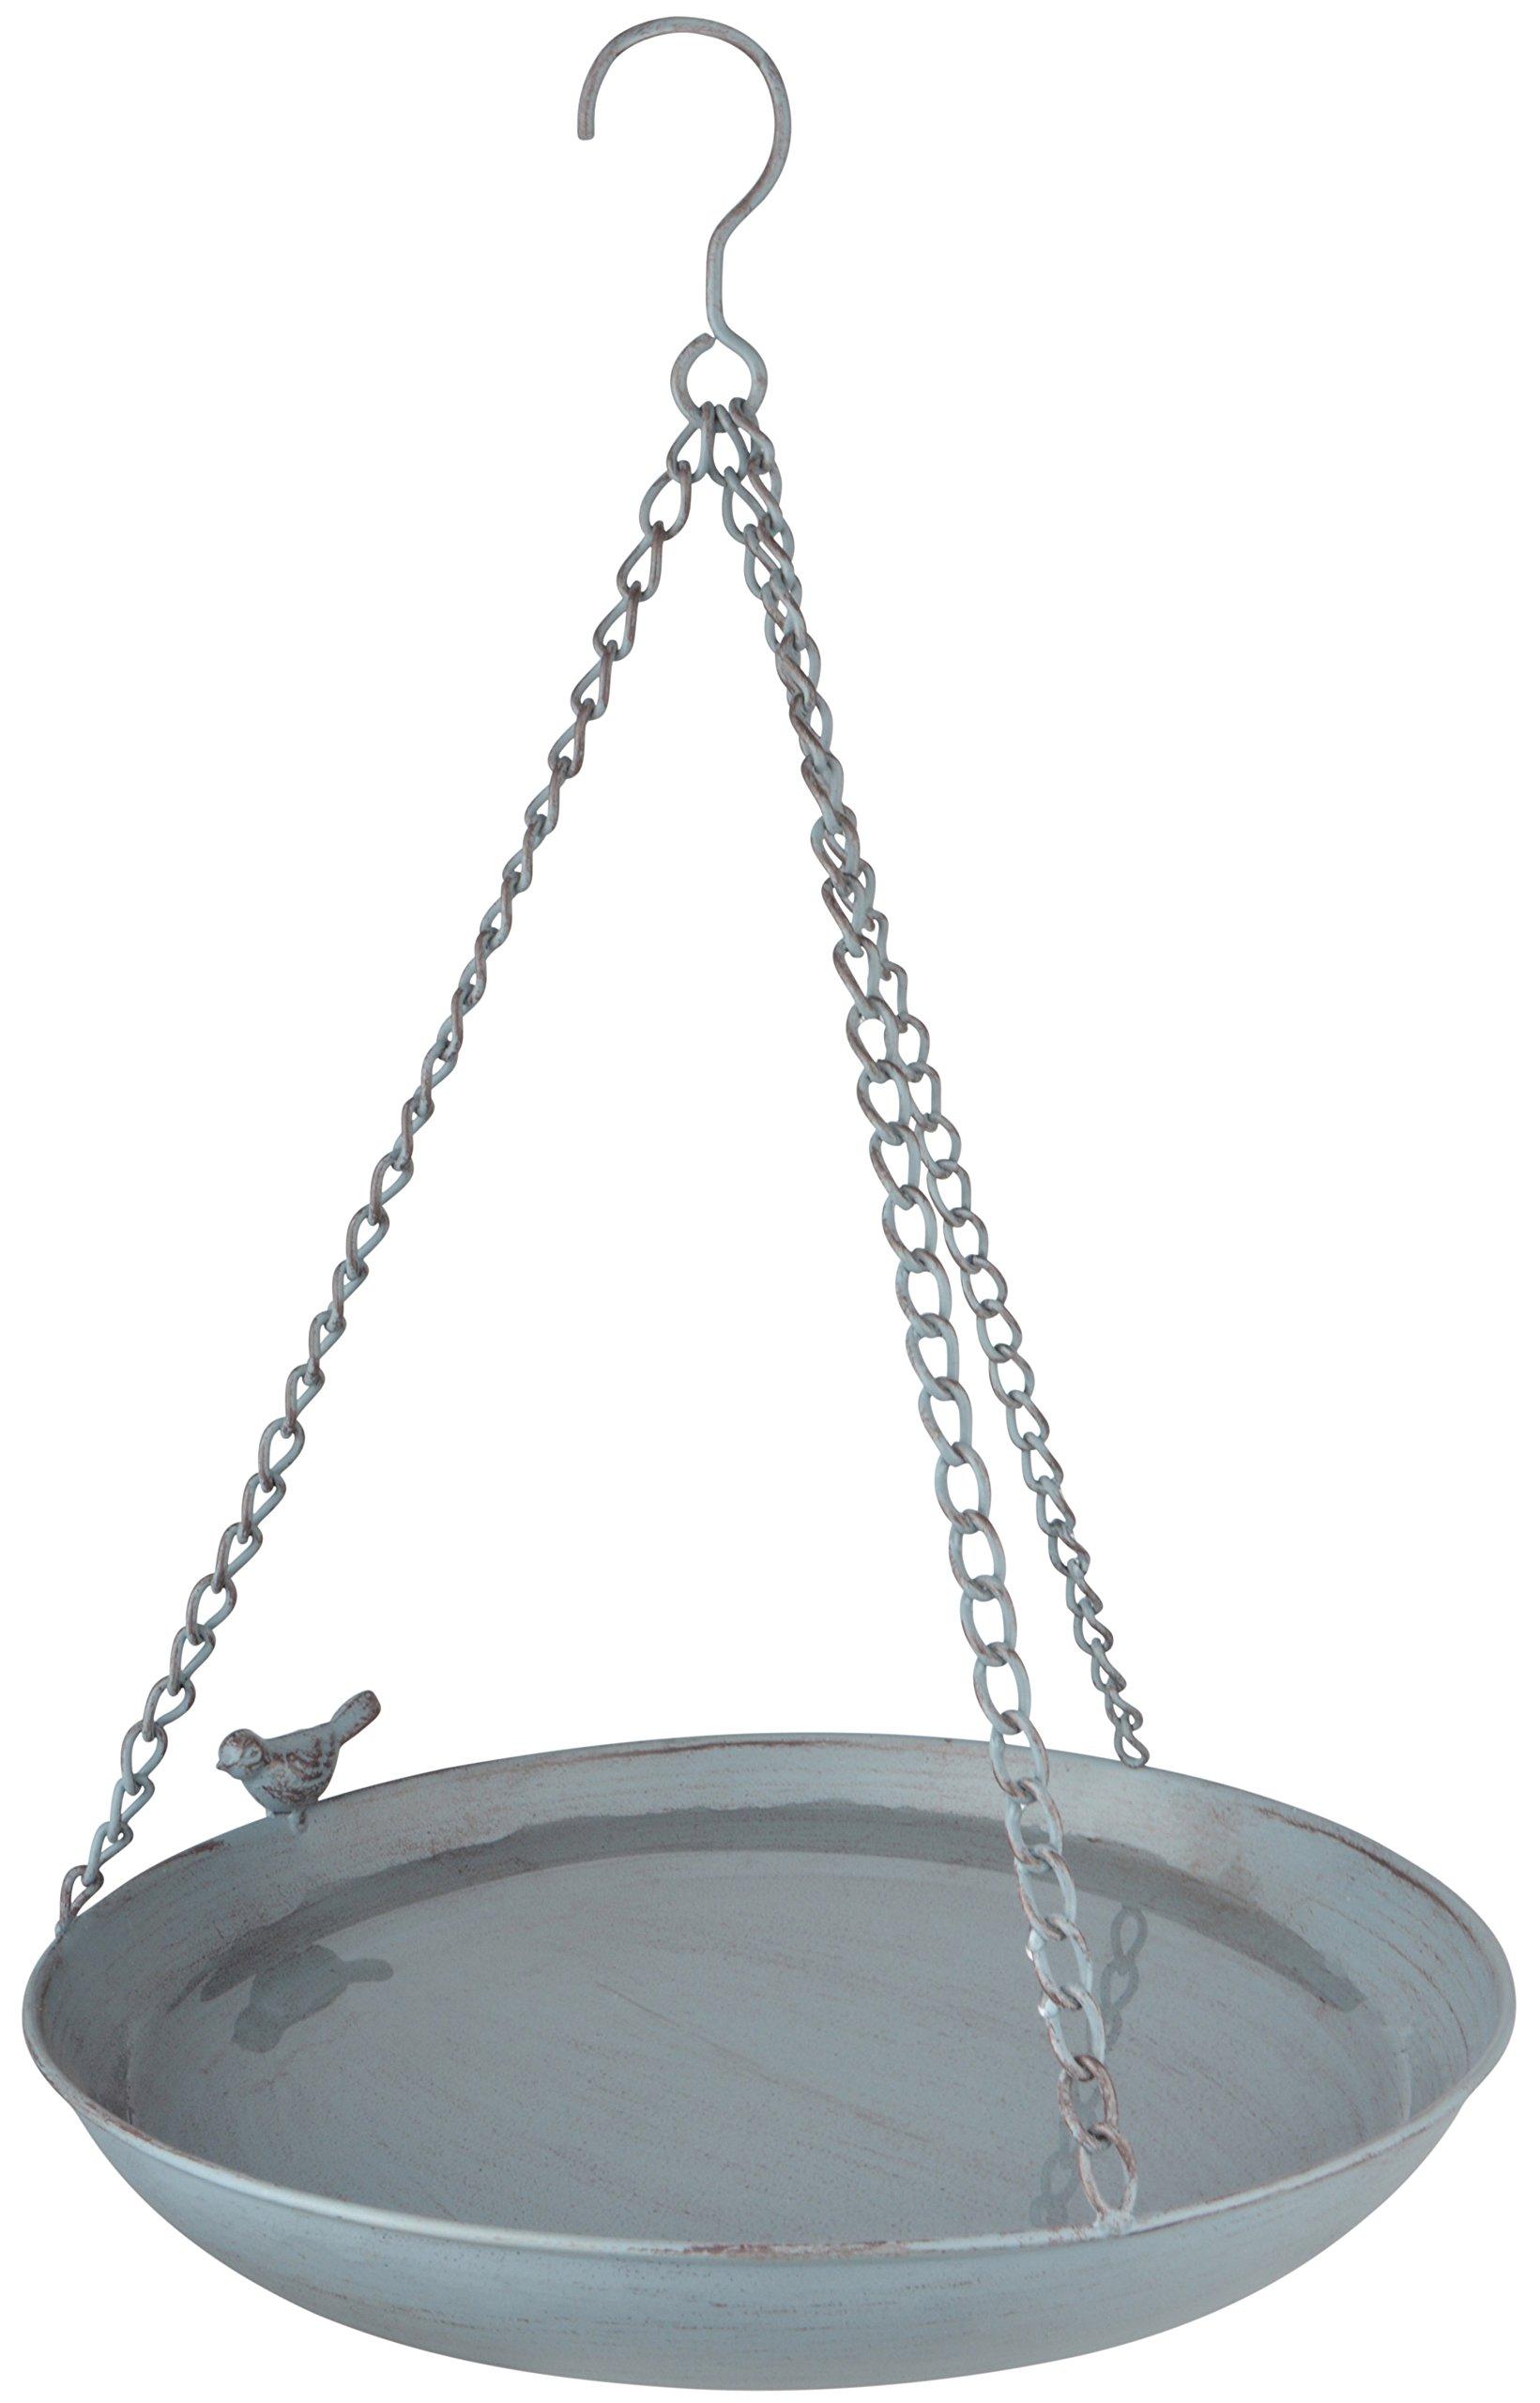 Esschert Design FB403 Series Hanging Bird Bath